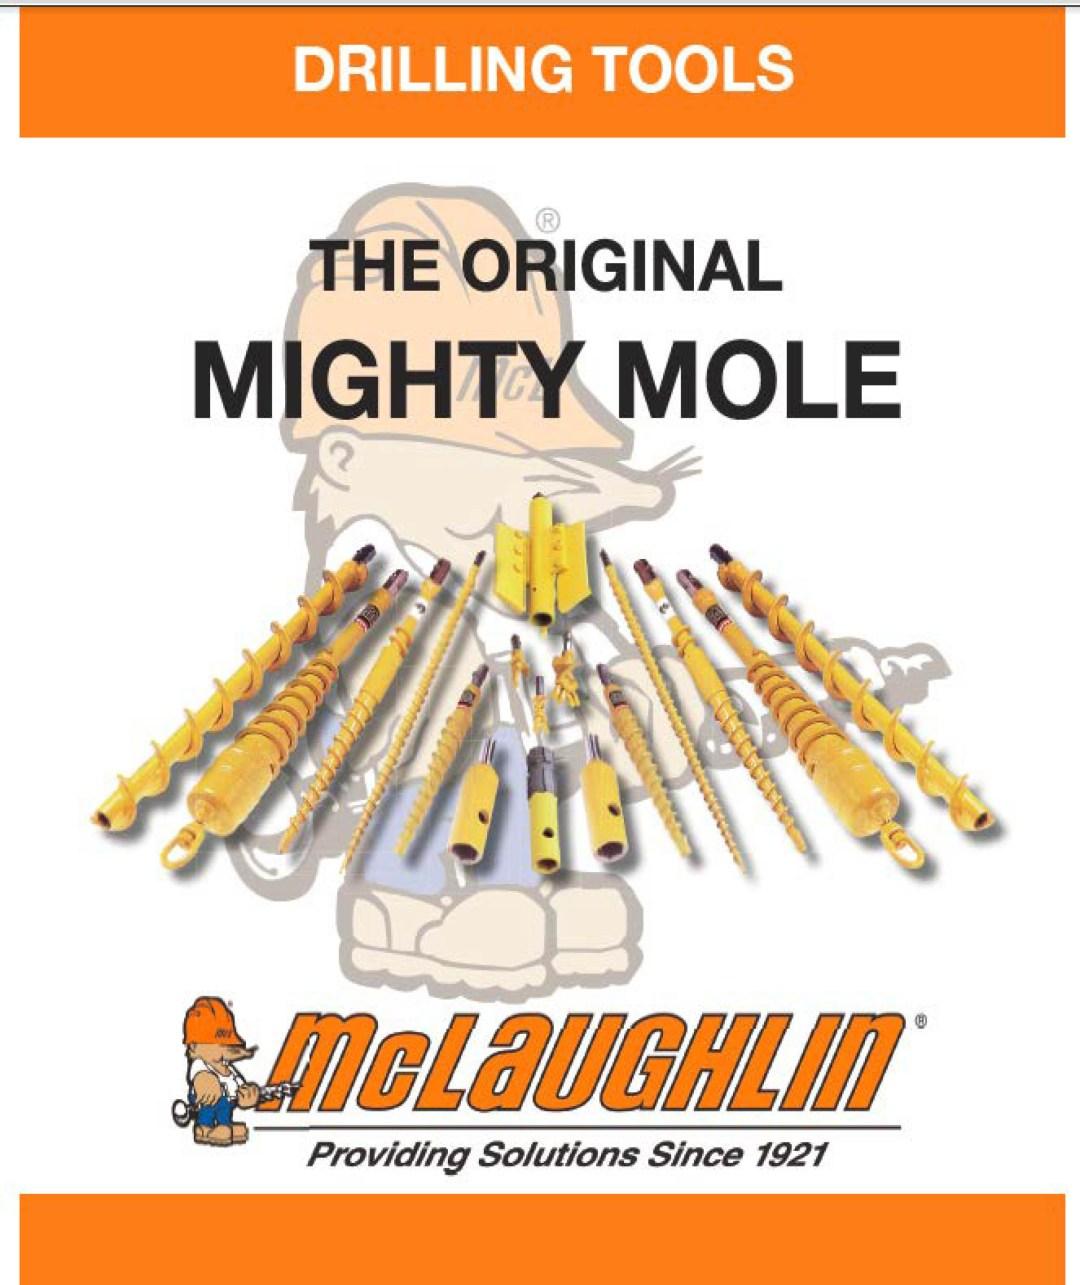 Mighty Mole Drilling Tool catalog